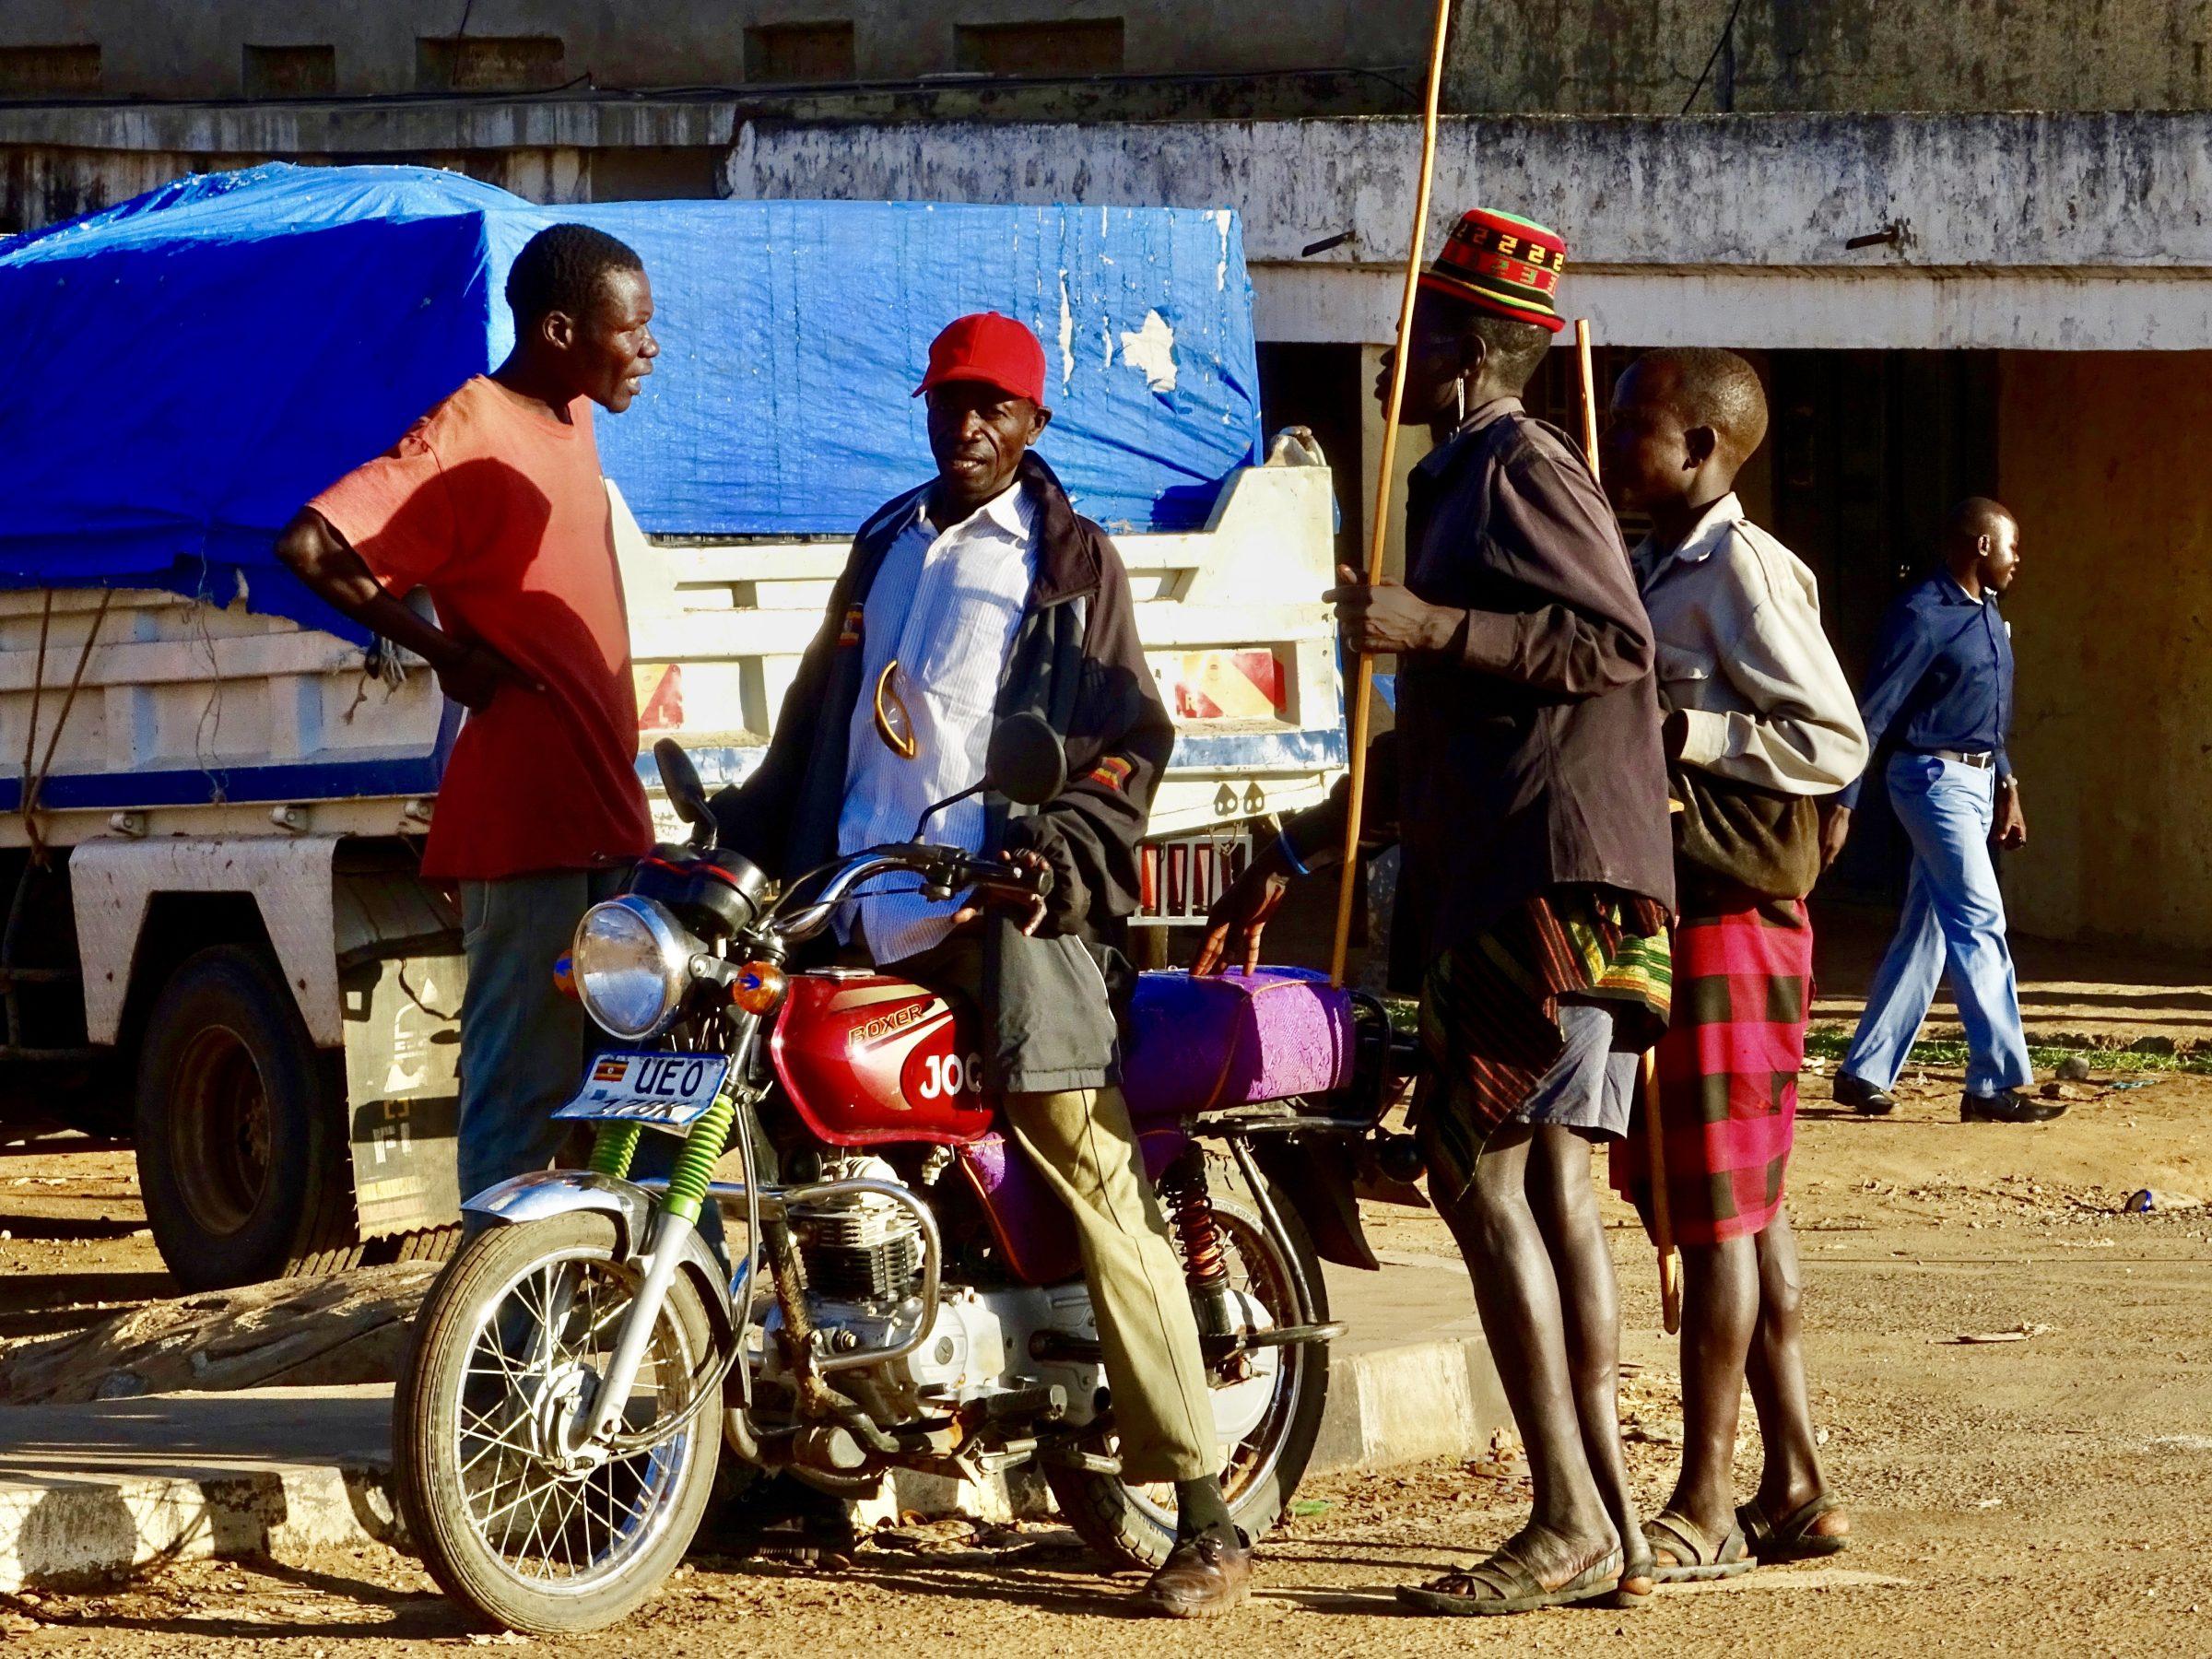 Boda boda chauffeur met twee Karamojong passagiers op de toegangsweg naar Moroto